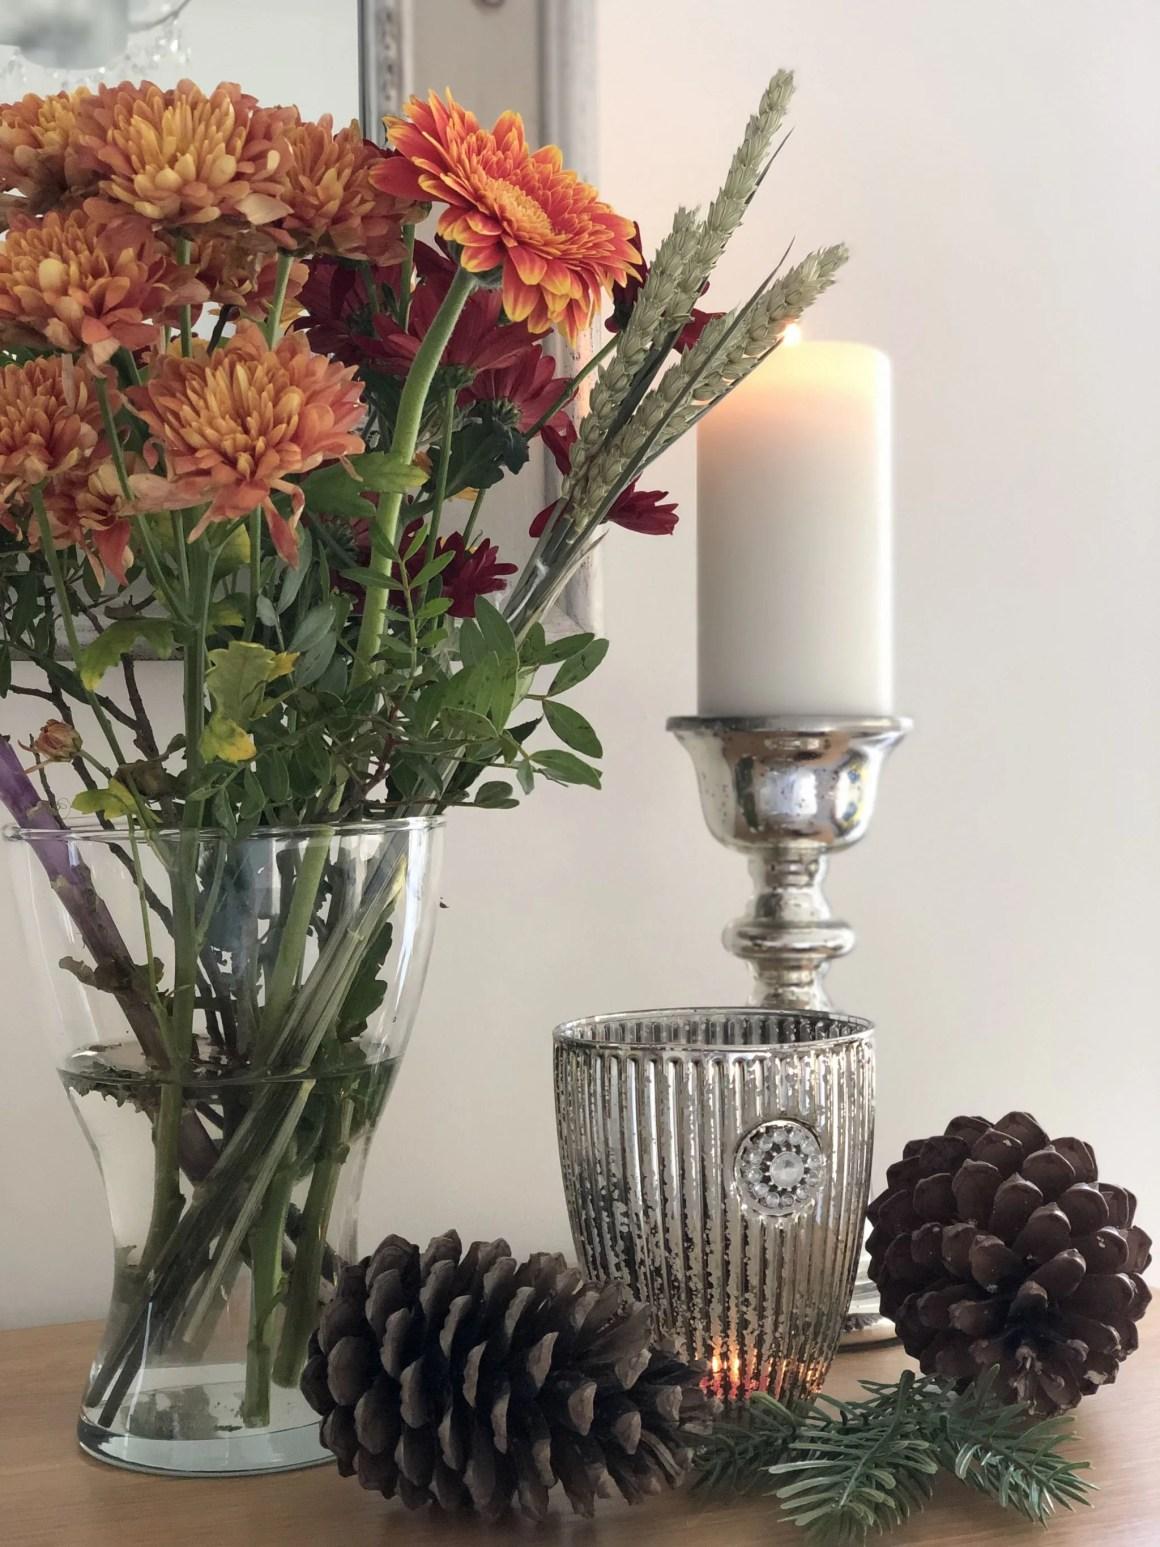 mercurised candles and cones